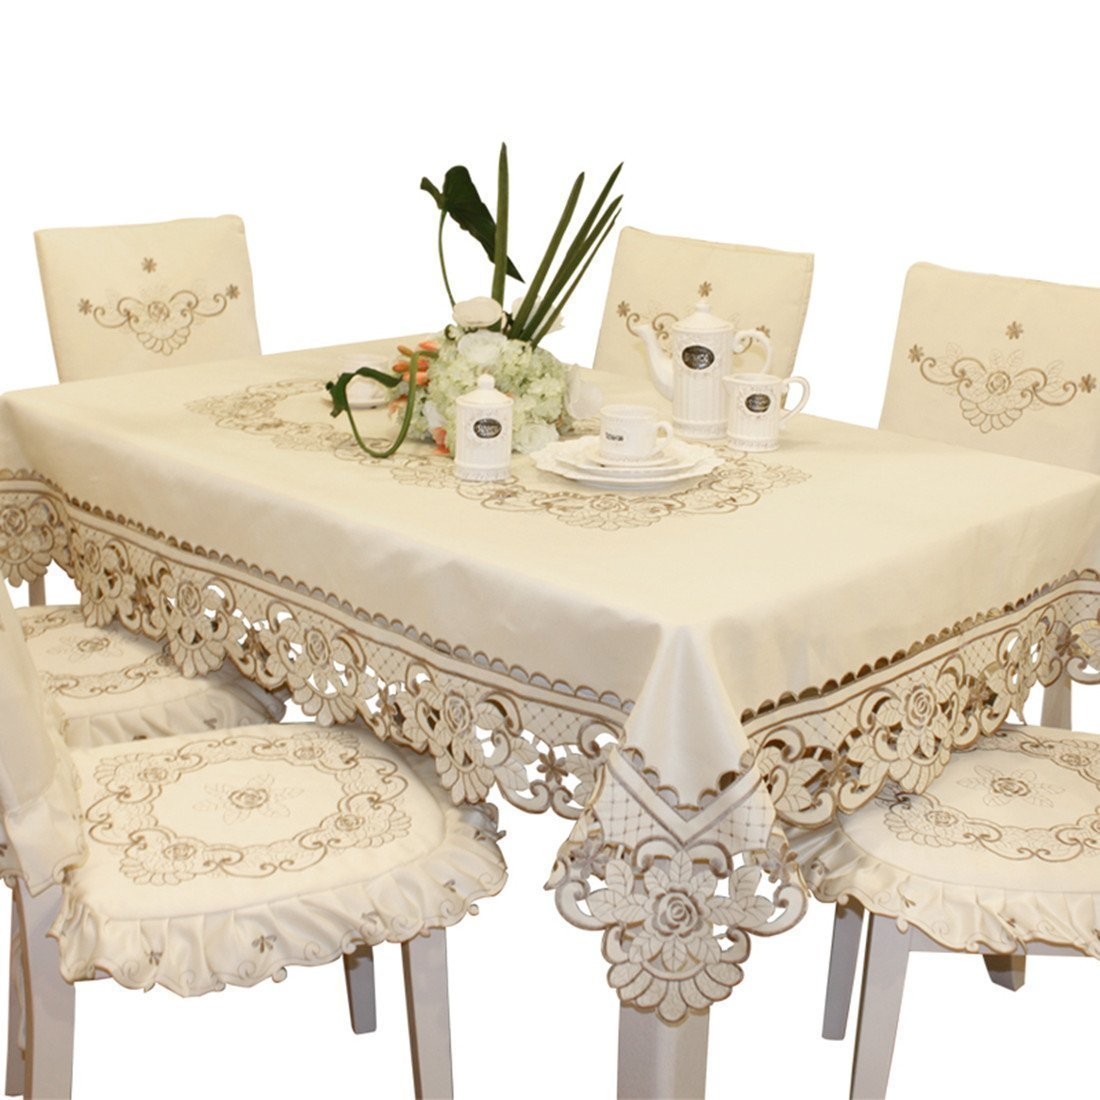 coffee table cloths. Black Bedroom Furniture Sets. Home Design Ideas